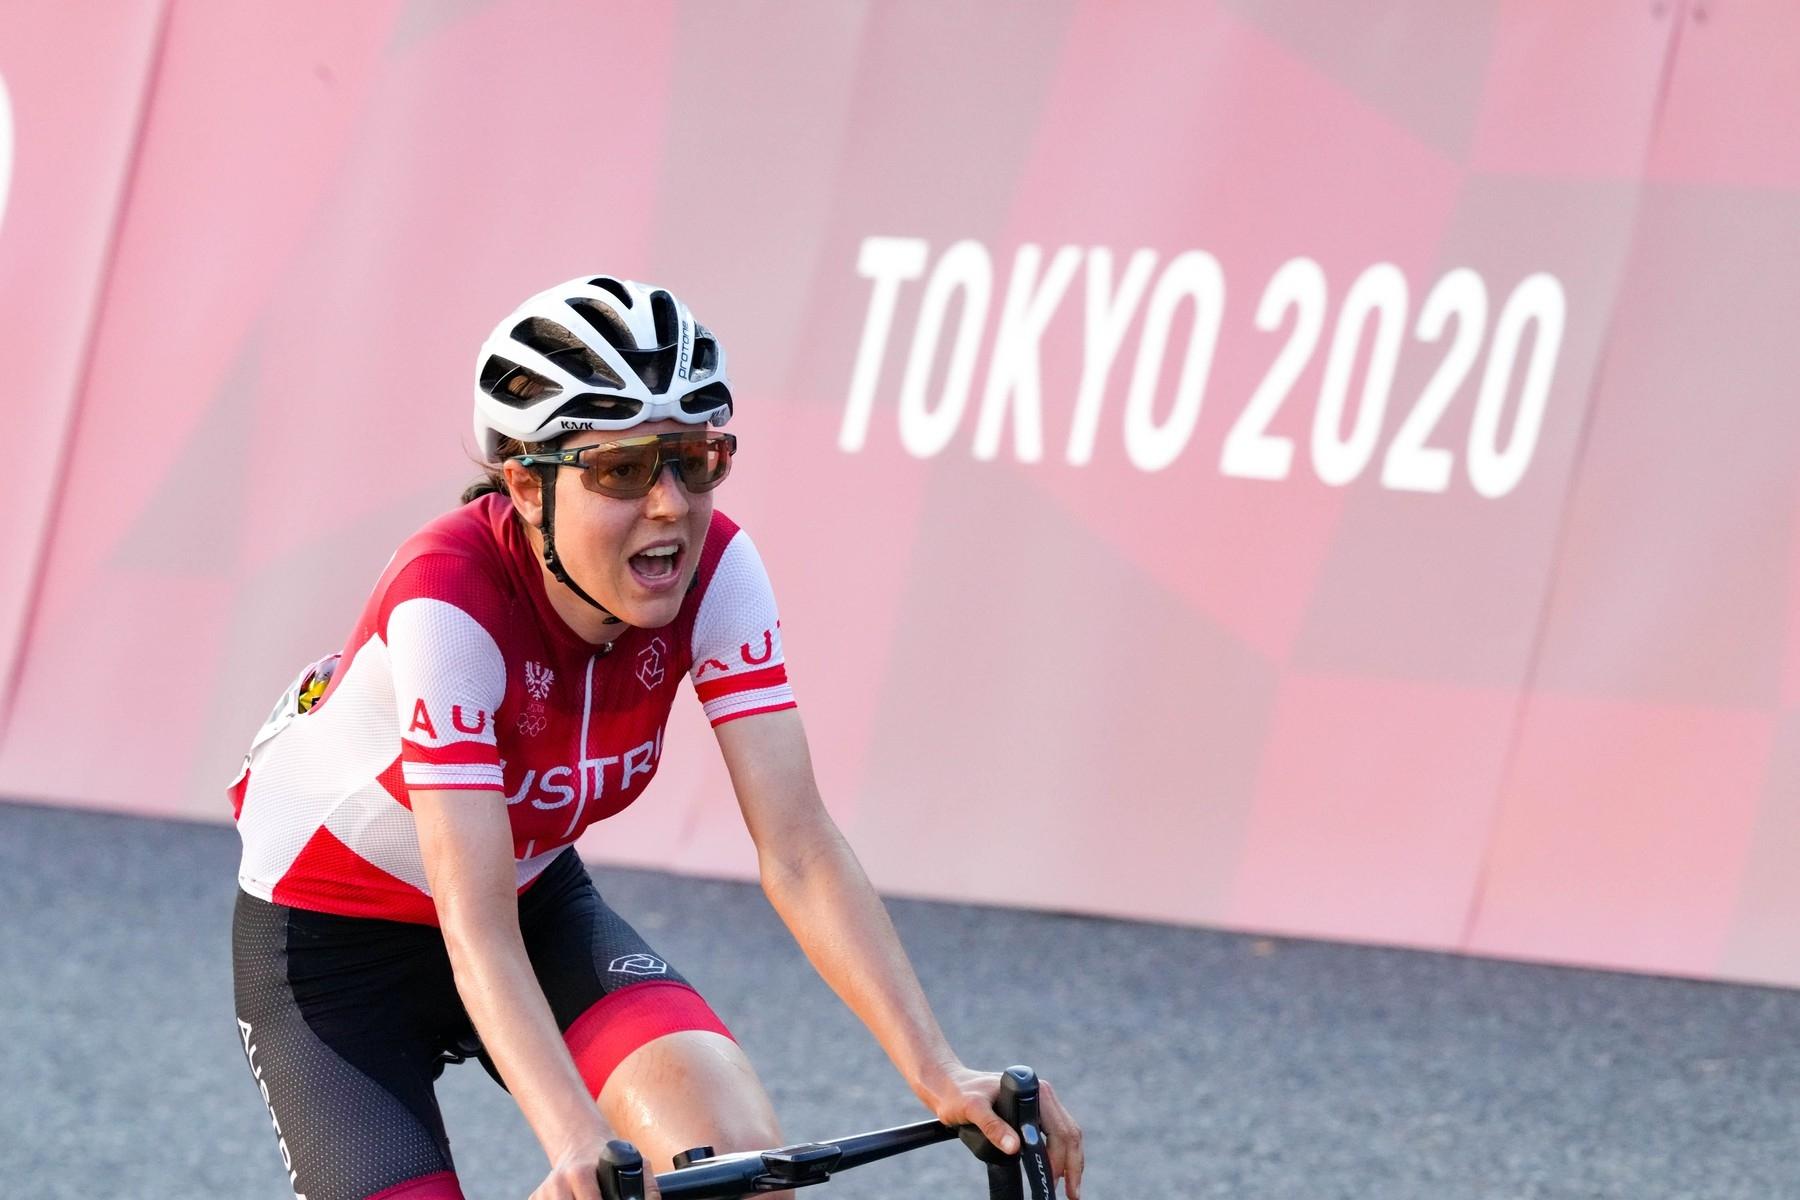 Anna Kiesenhoferová v Tokiu, ač amatérka, vybojovala zlatou olympijskou medaili. Foto: profimedia (3x)